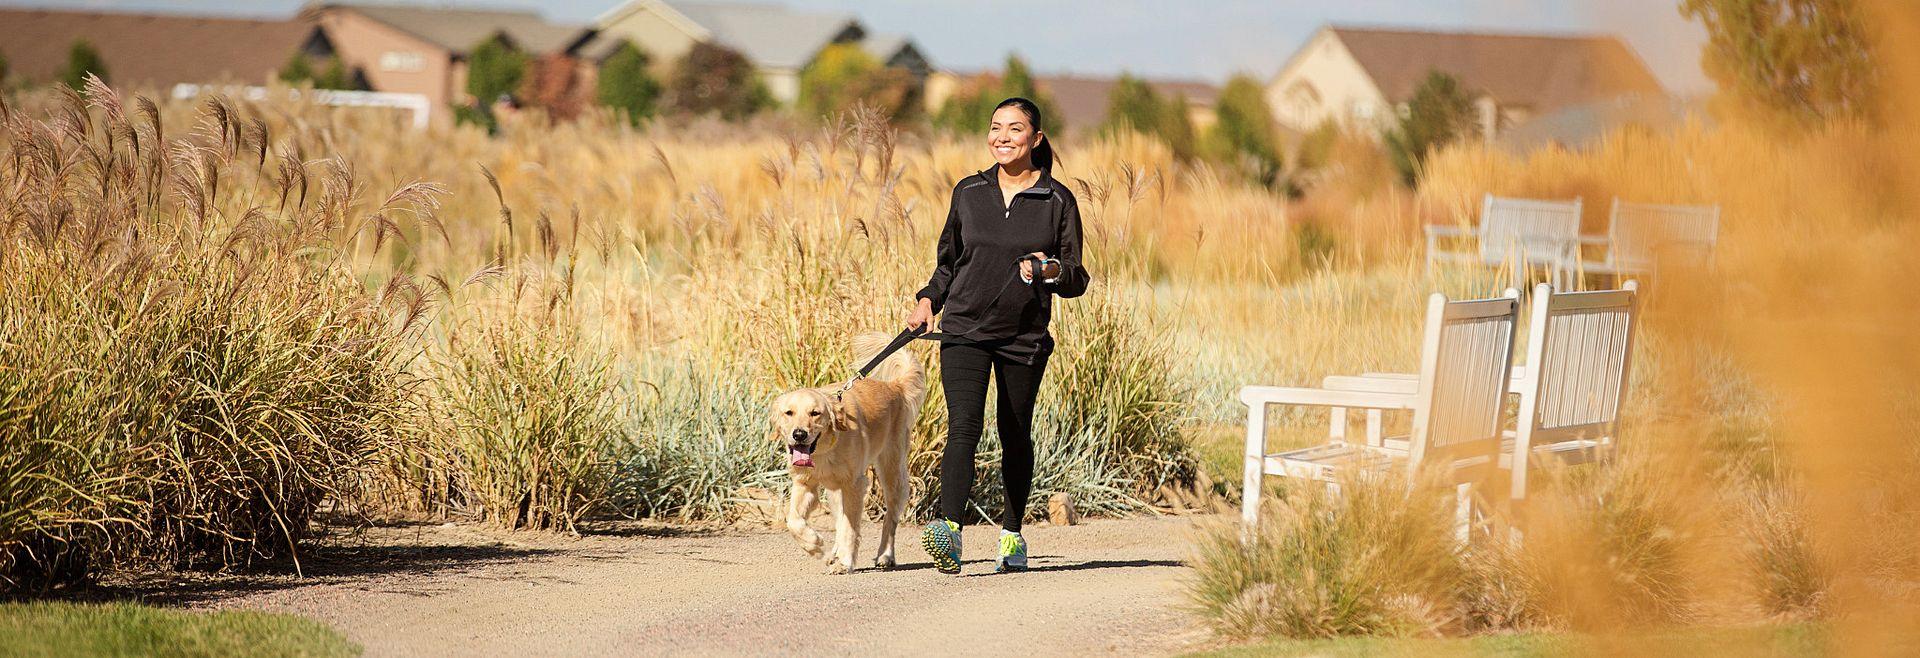 Reunion Community Woman Dog Walking Trails